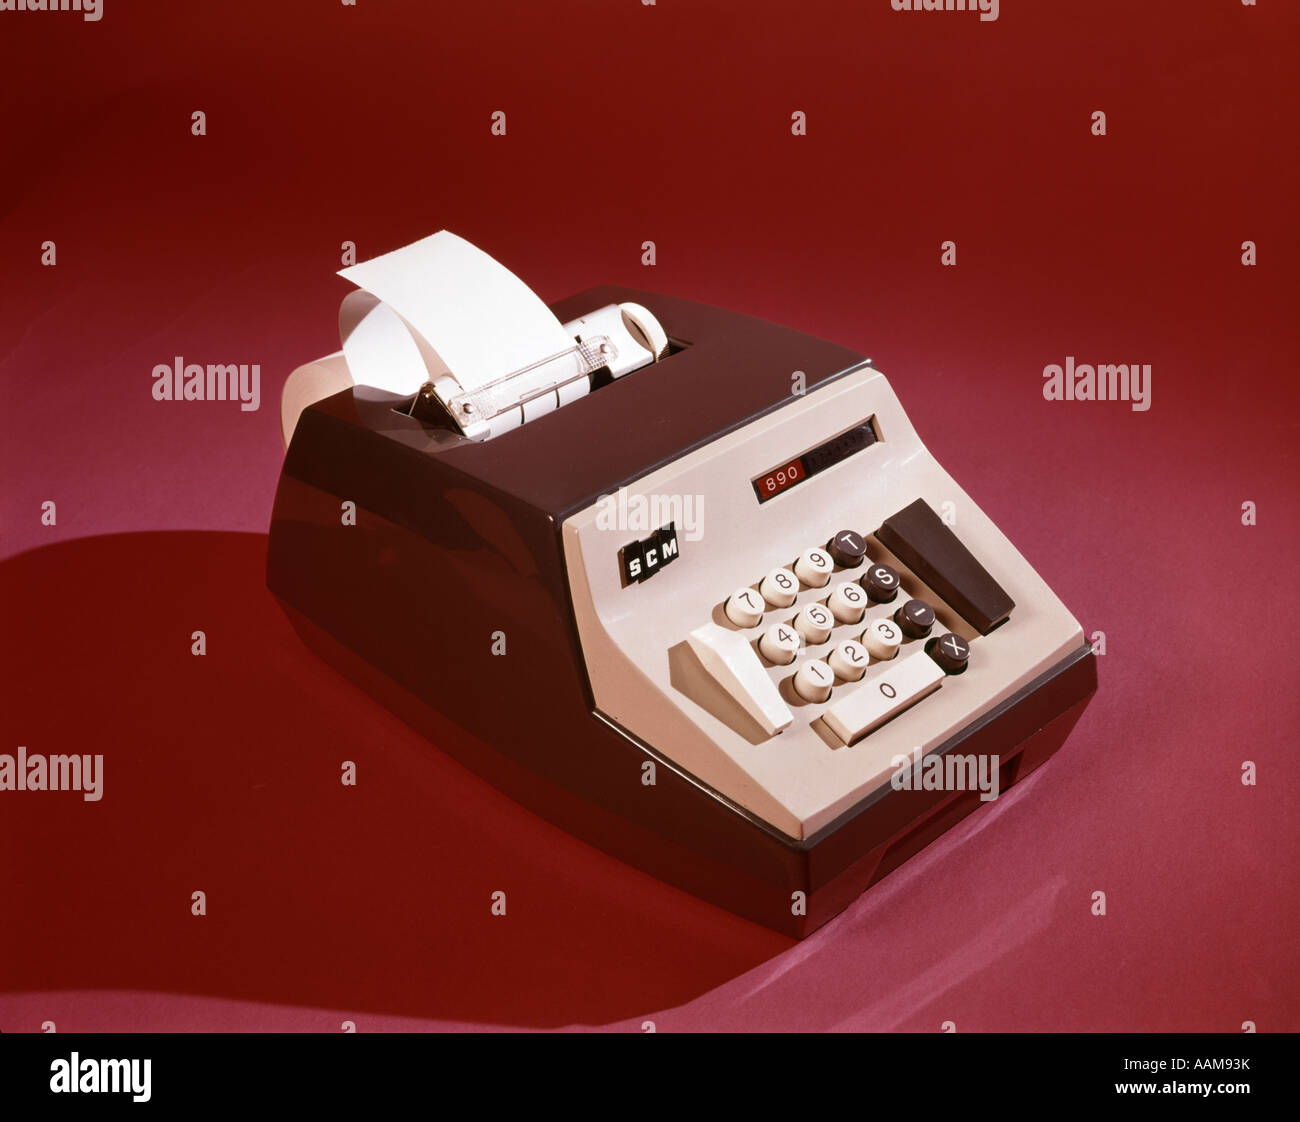 1960s 1970s OFFICE ADDING MACHINE SCM CALCULATOR EQUIPMENT TAPE - Stock Image